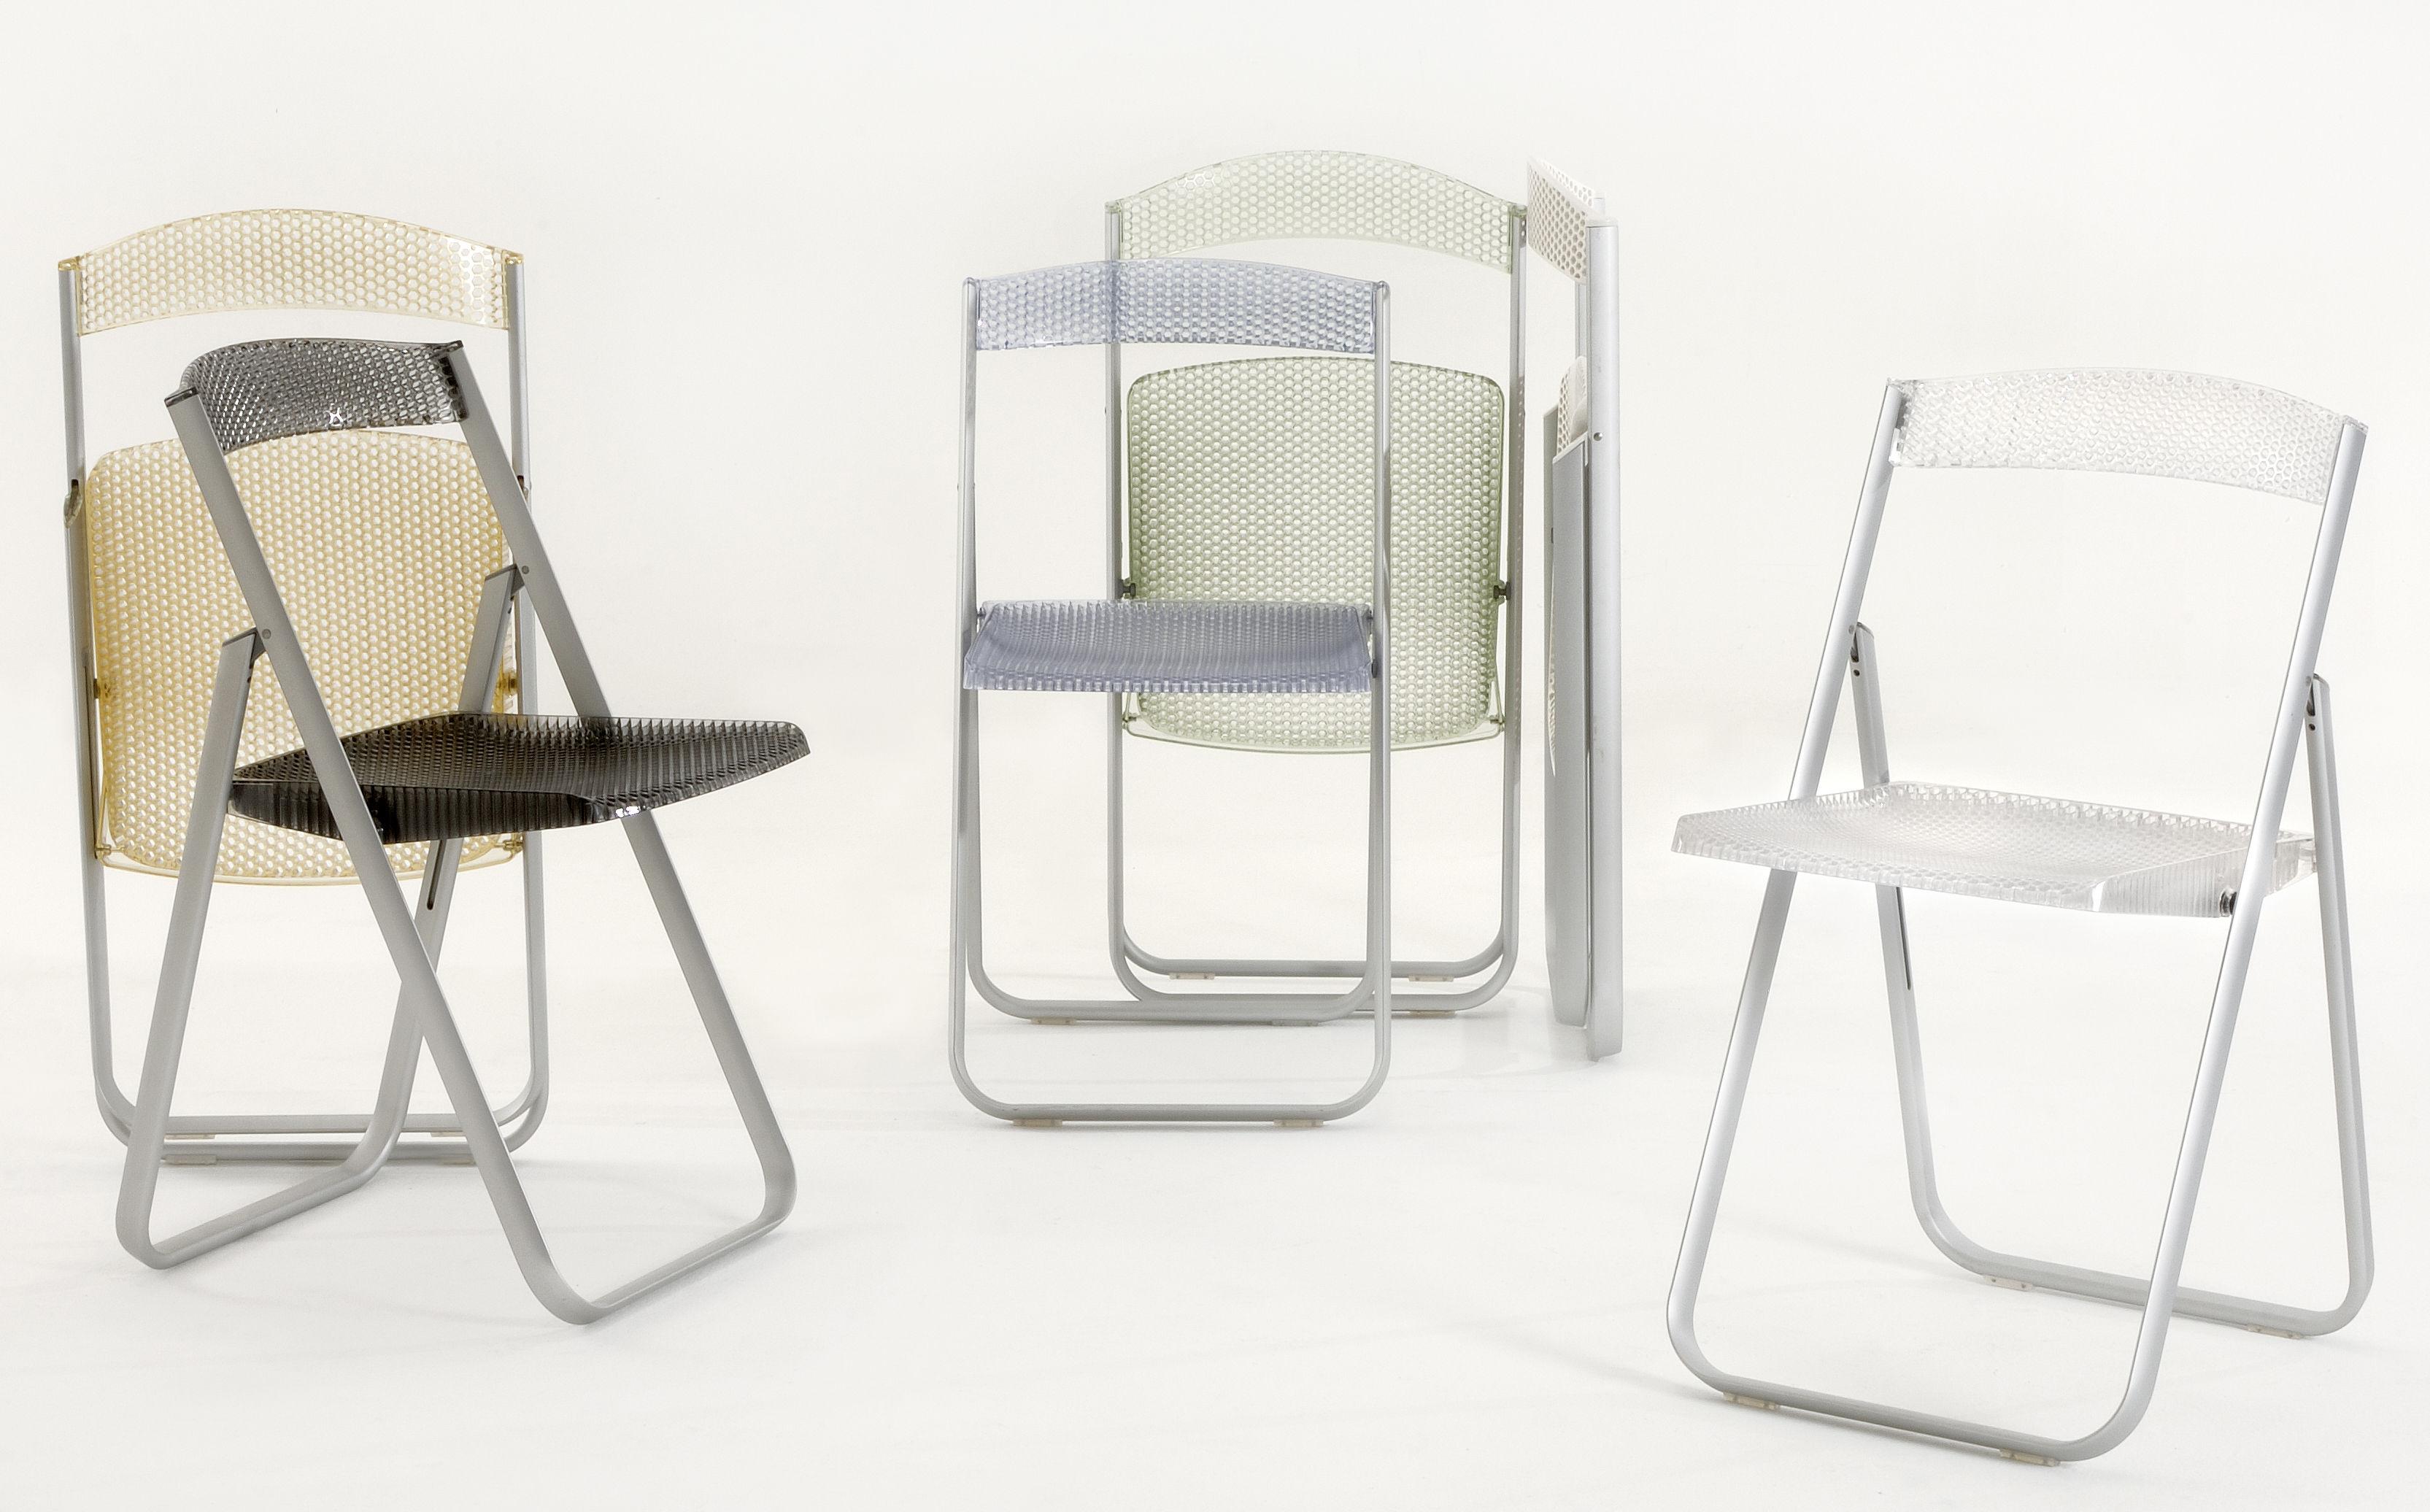 chaise pliante honeycomb transparente polycarbonate m tal cristal kartell. Black Bedroom Furniture Sets. Home Design Ideas